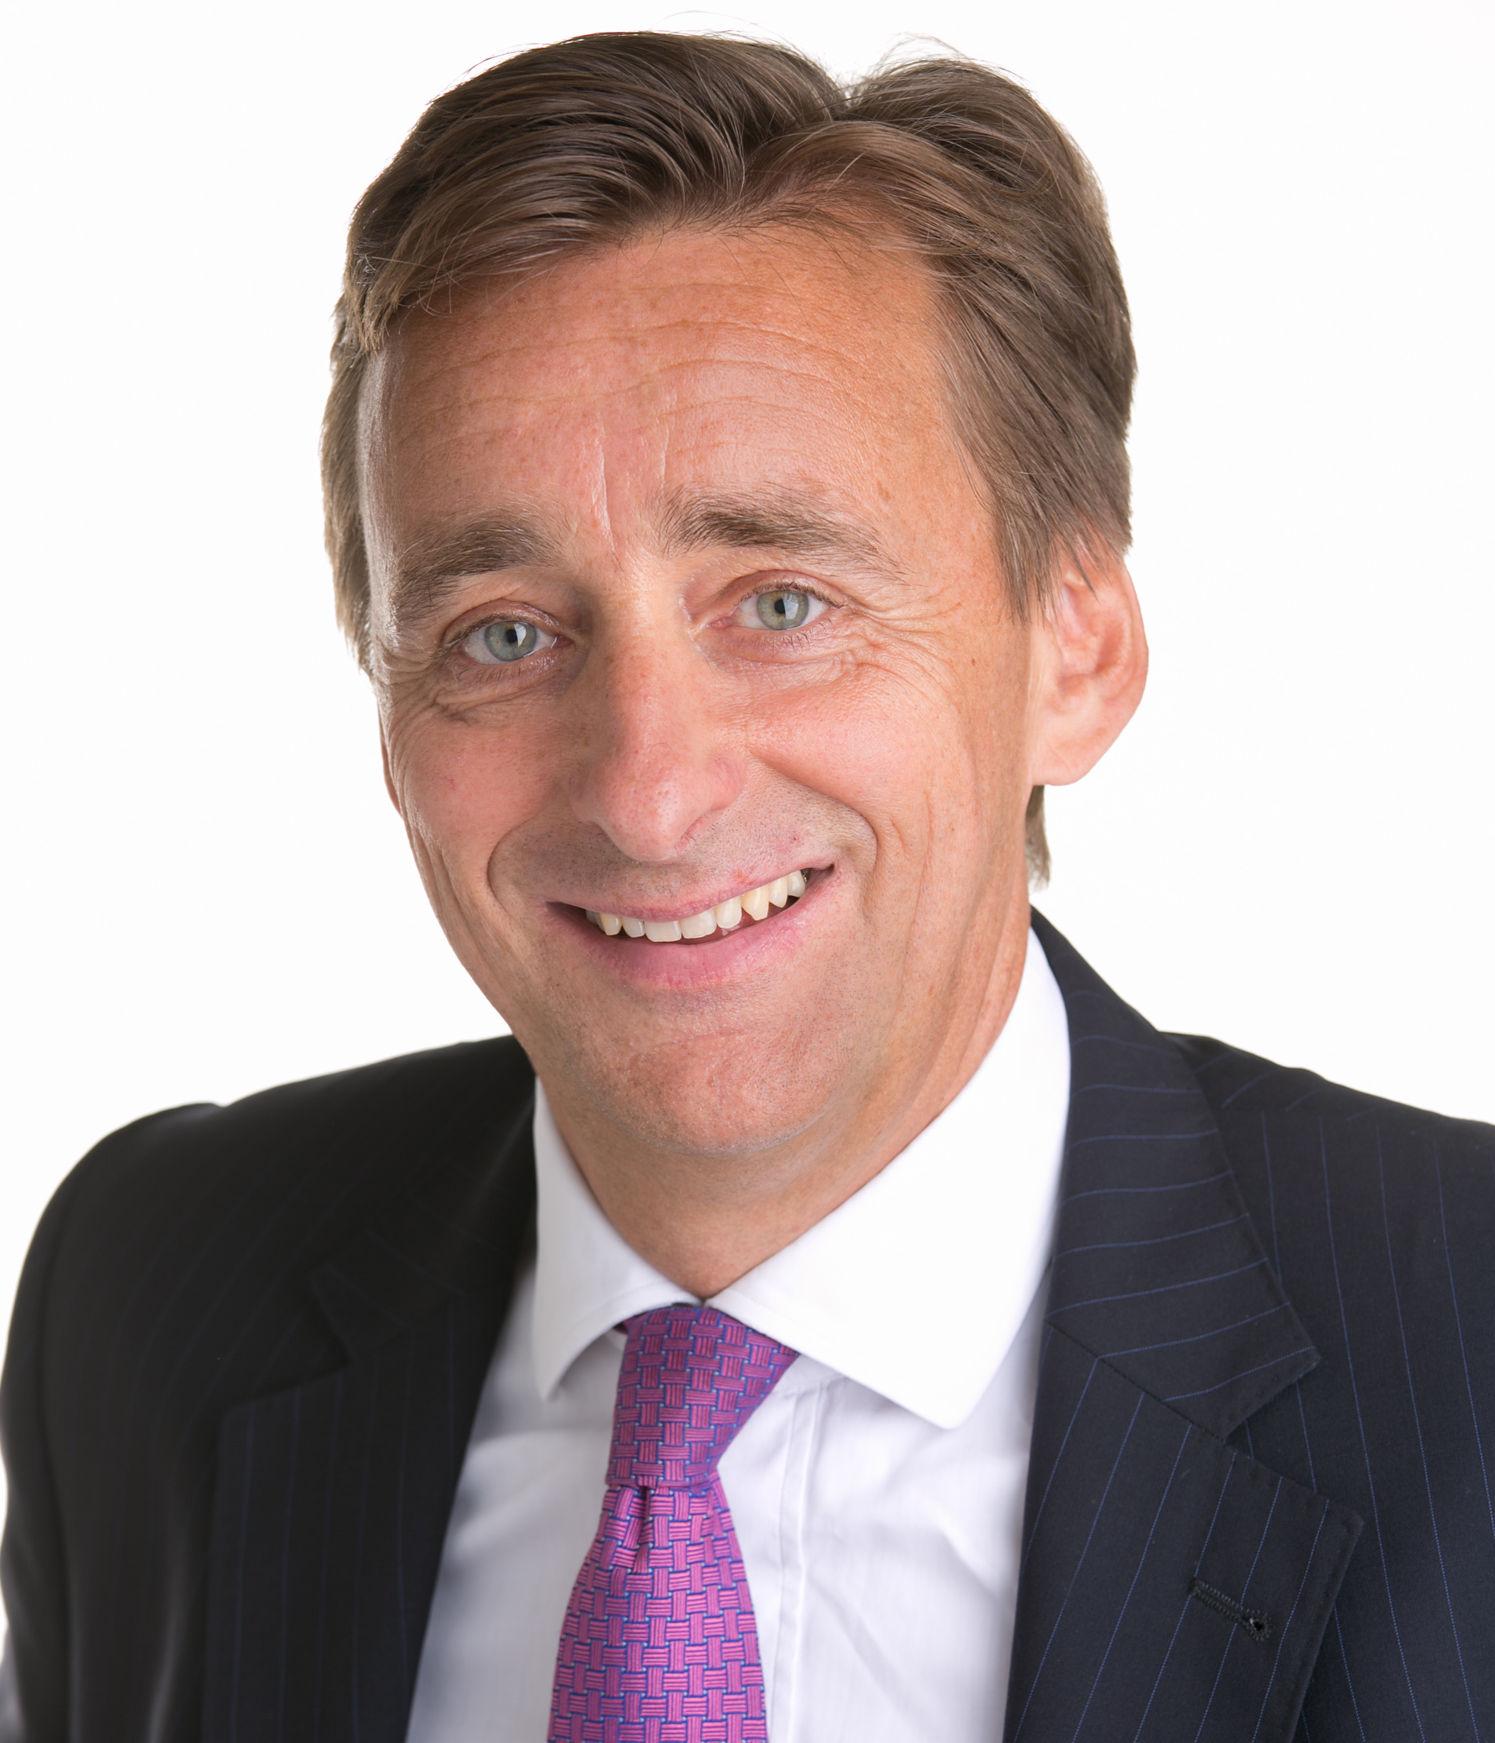 Andreas Ridder, Chairman CEE bei CBRE